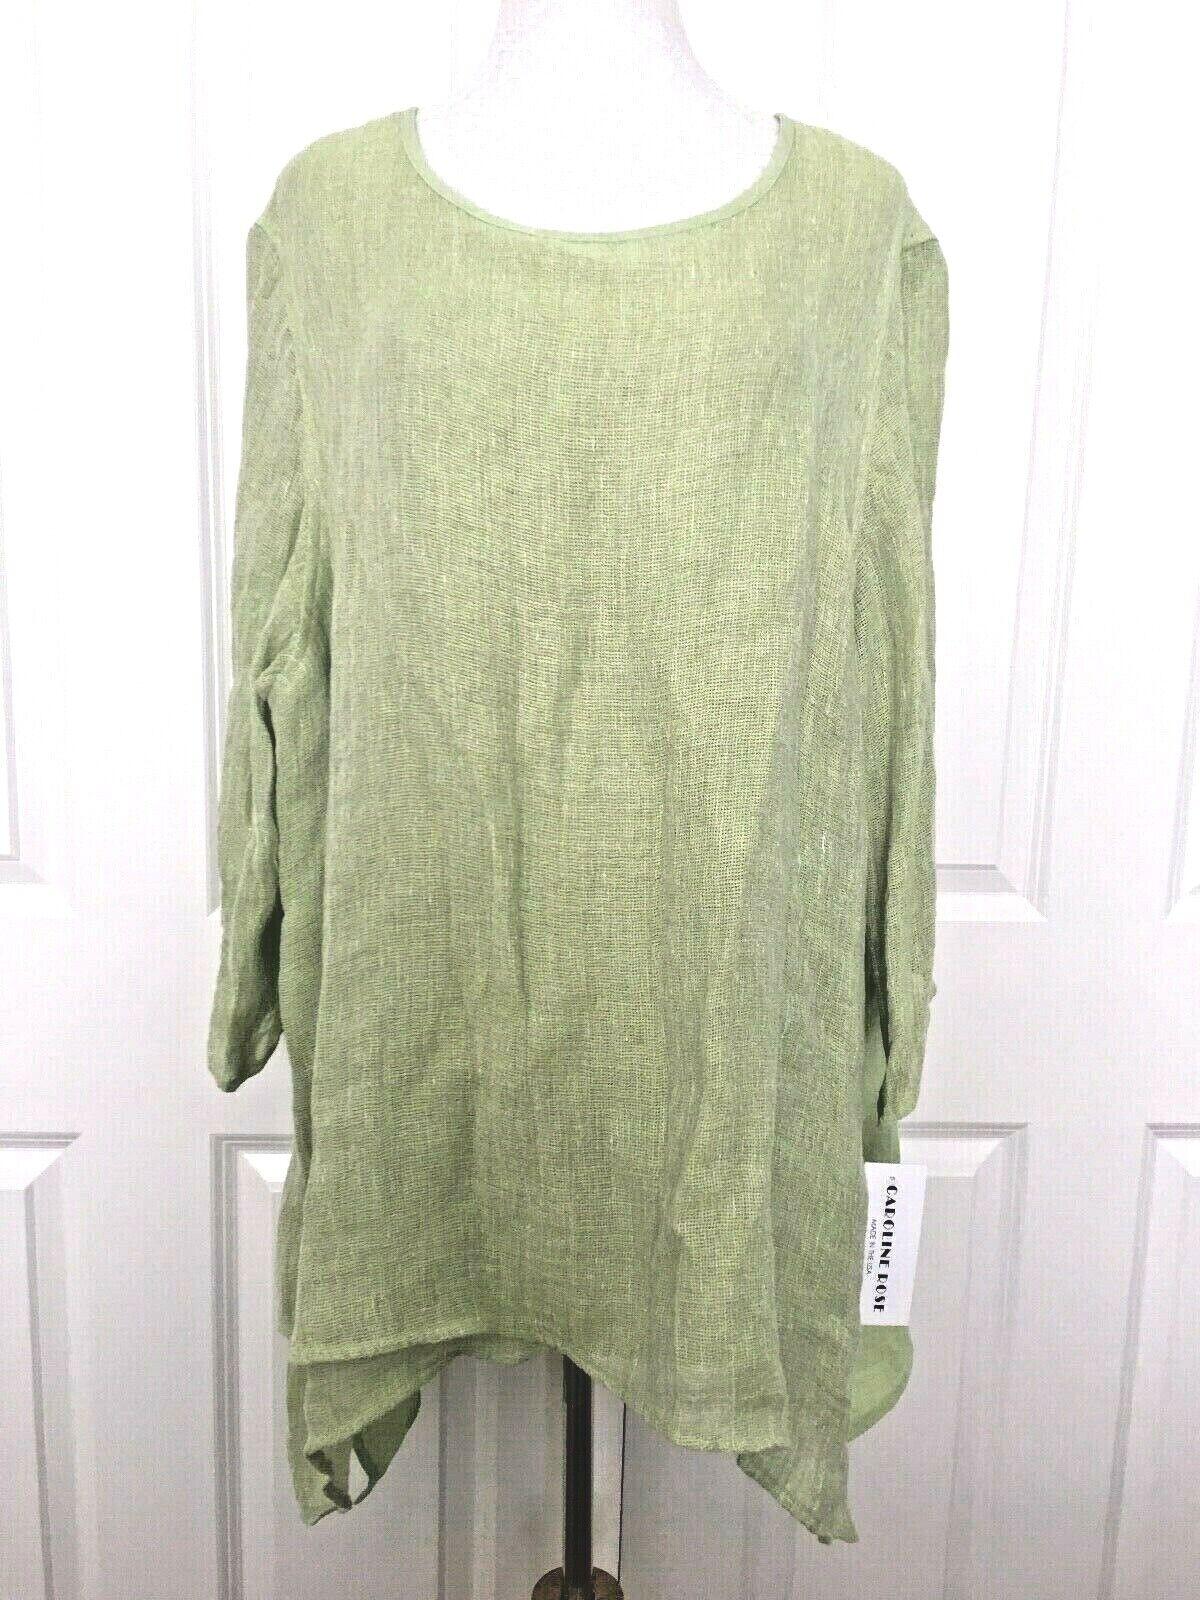 New New New Caroline pink Linen Tunic Shirt Top 3X Plus Lime Green Neiman Marcus b47504